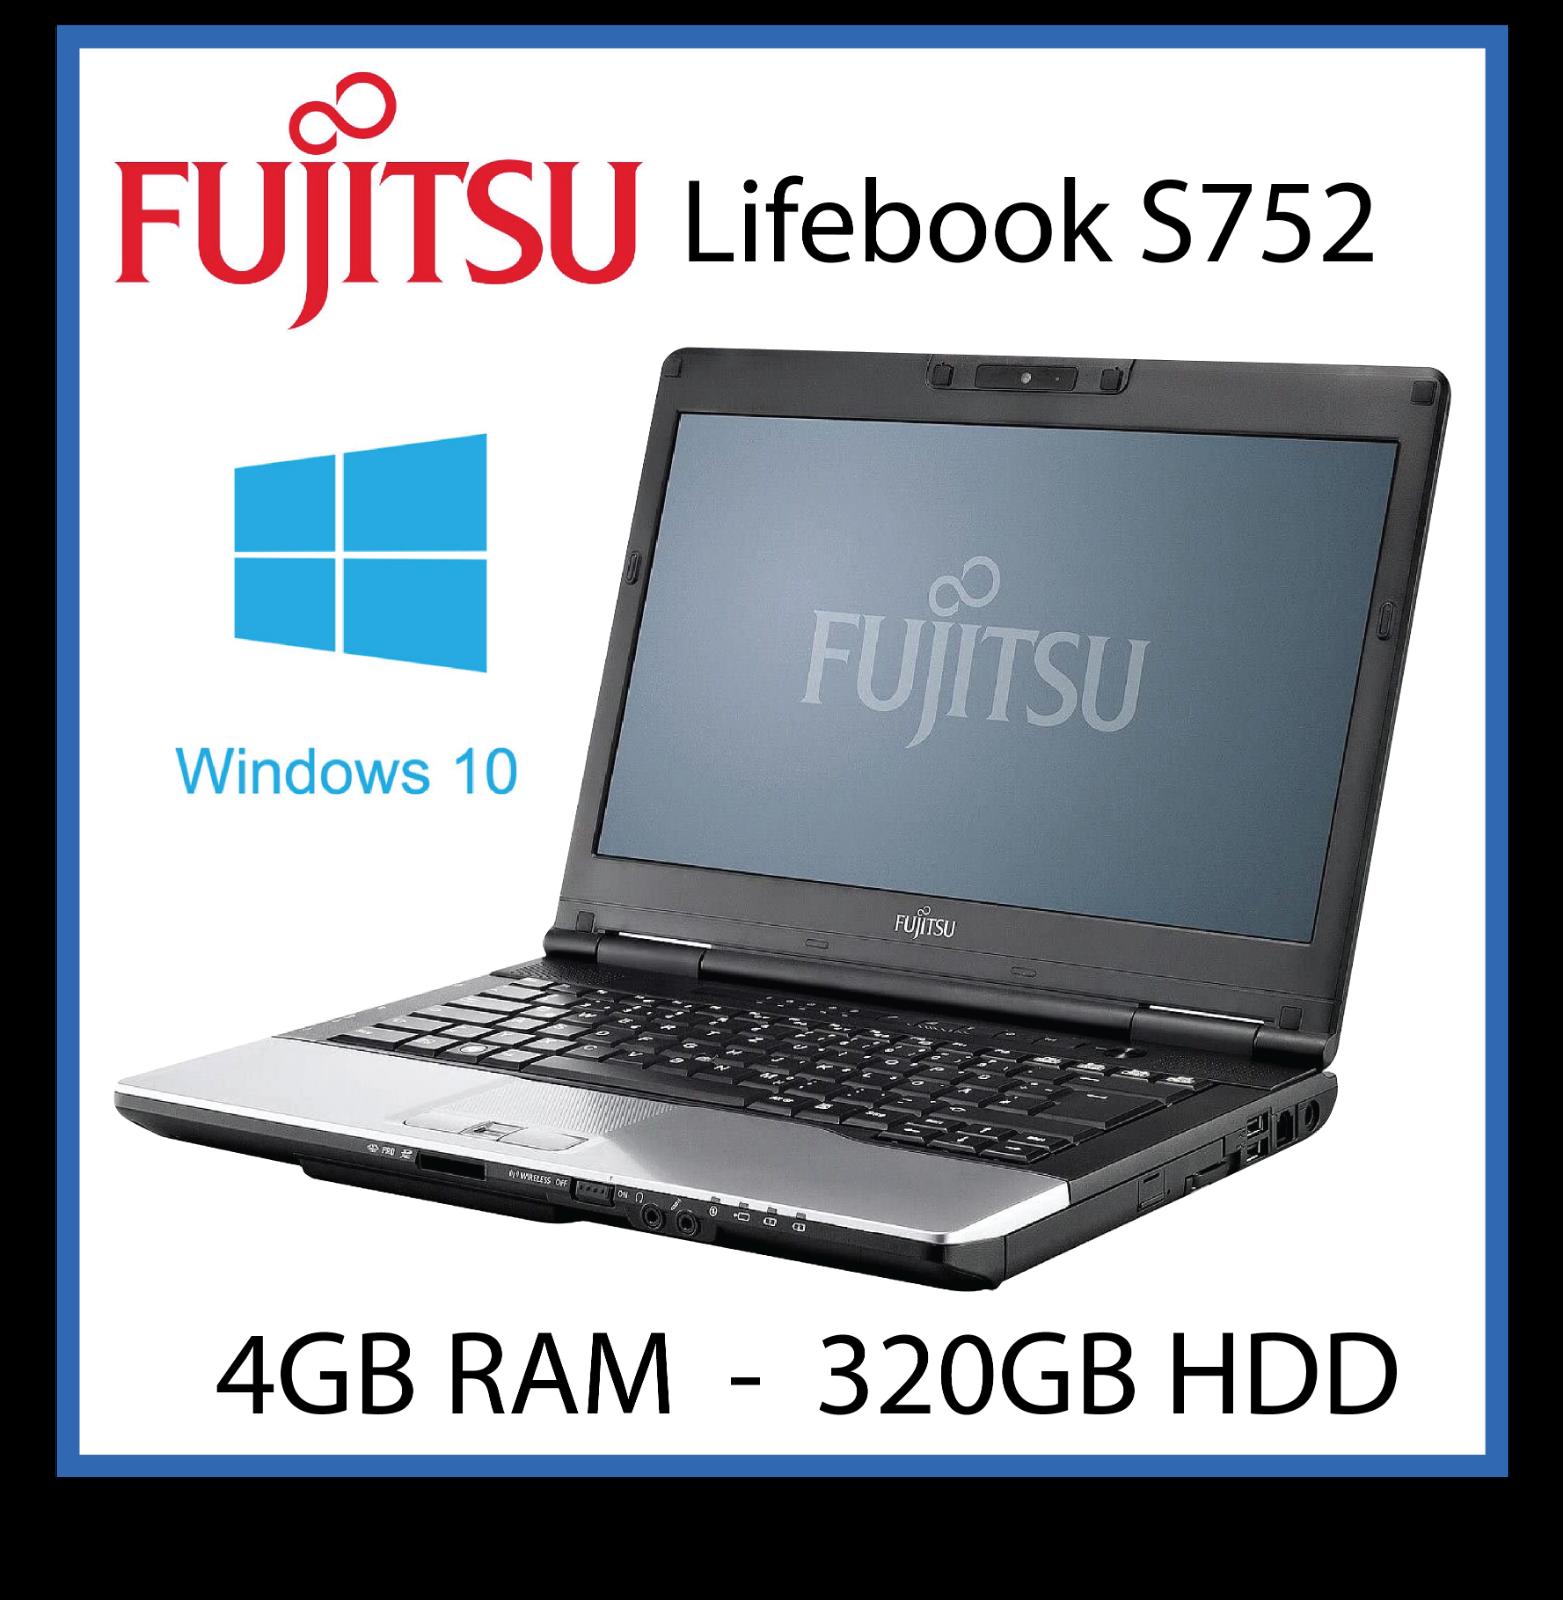 Laptop Windows - Cheap Laptop Windows 10 Fujitsu S752 Intel Core i5 3230m 3rd 2.6GHz 4GB 320GB